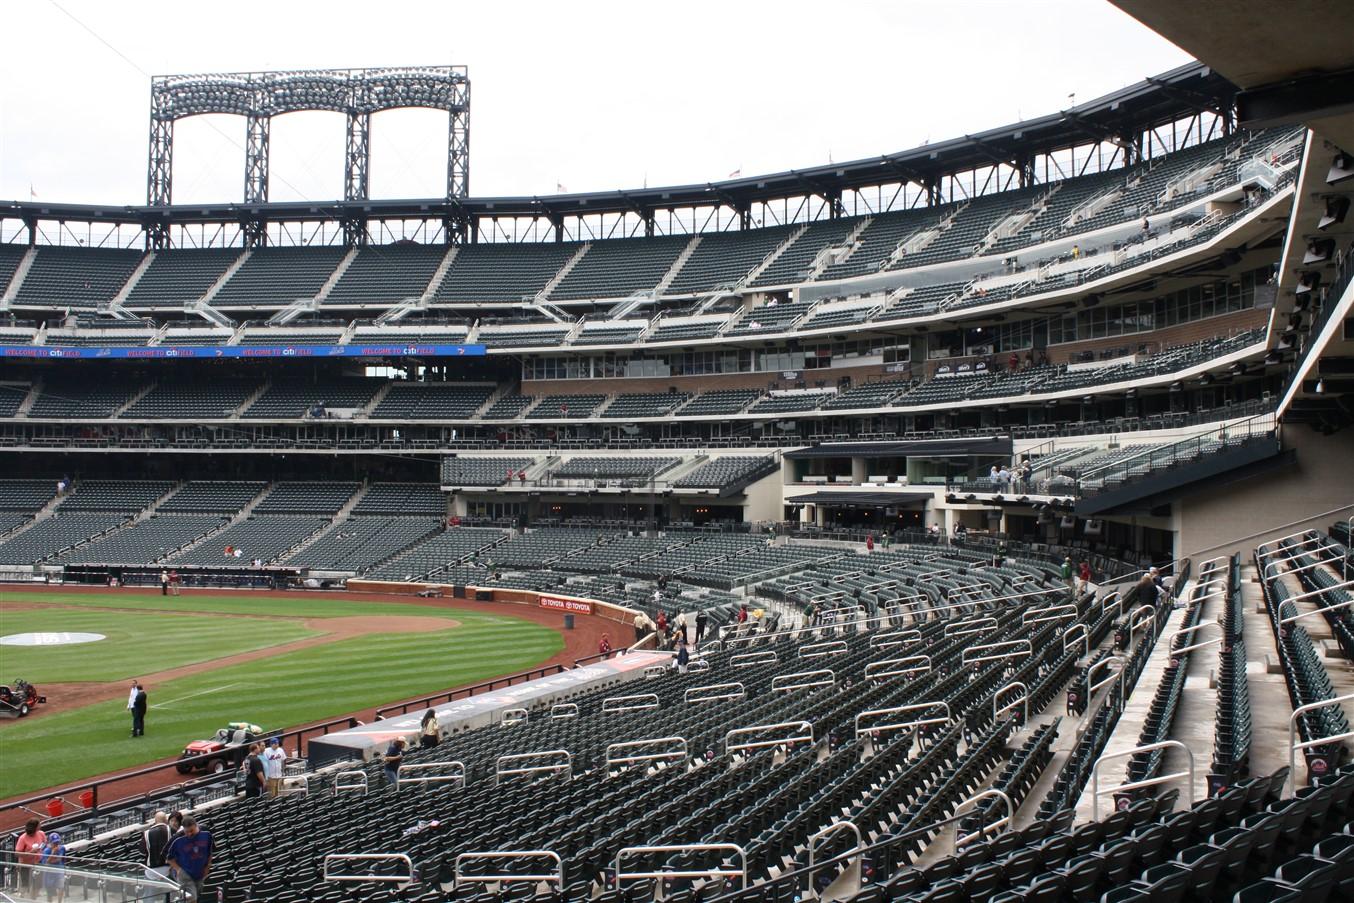 2009 06 21 Law School Road Trip Day 6 New York Mets 54.jpg